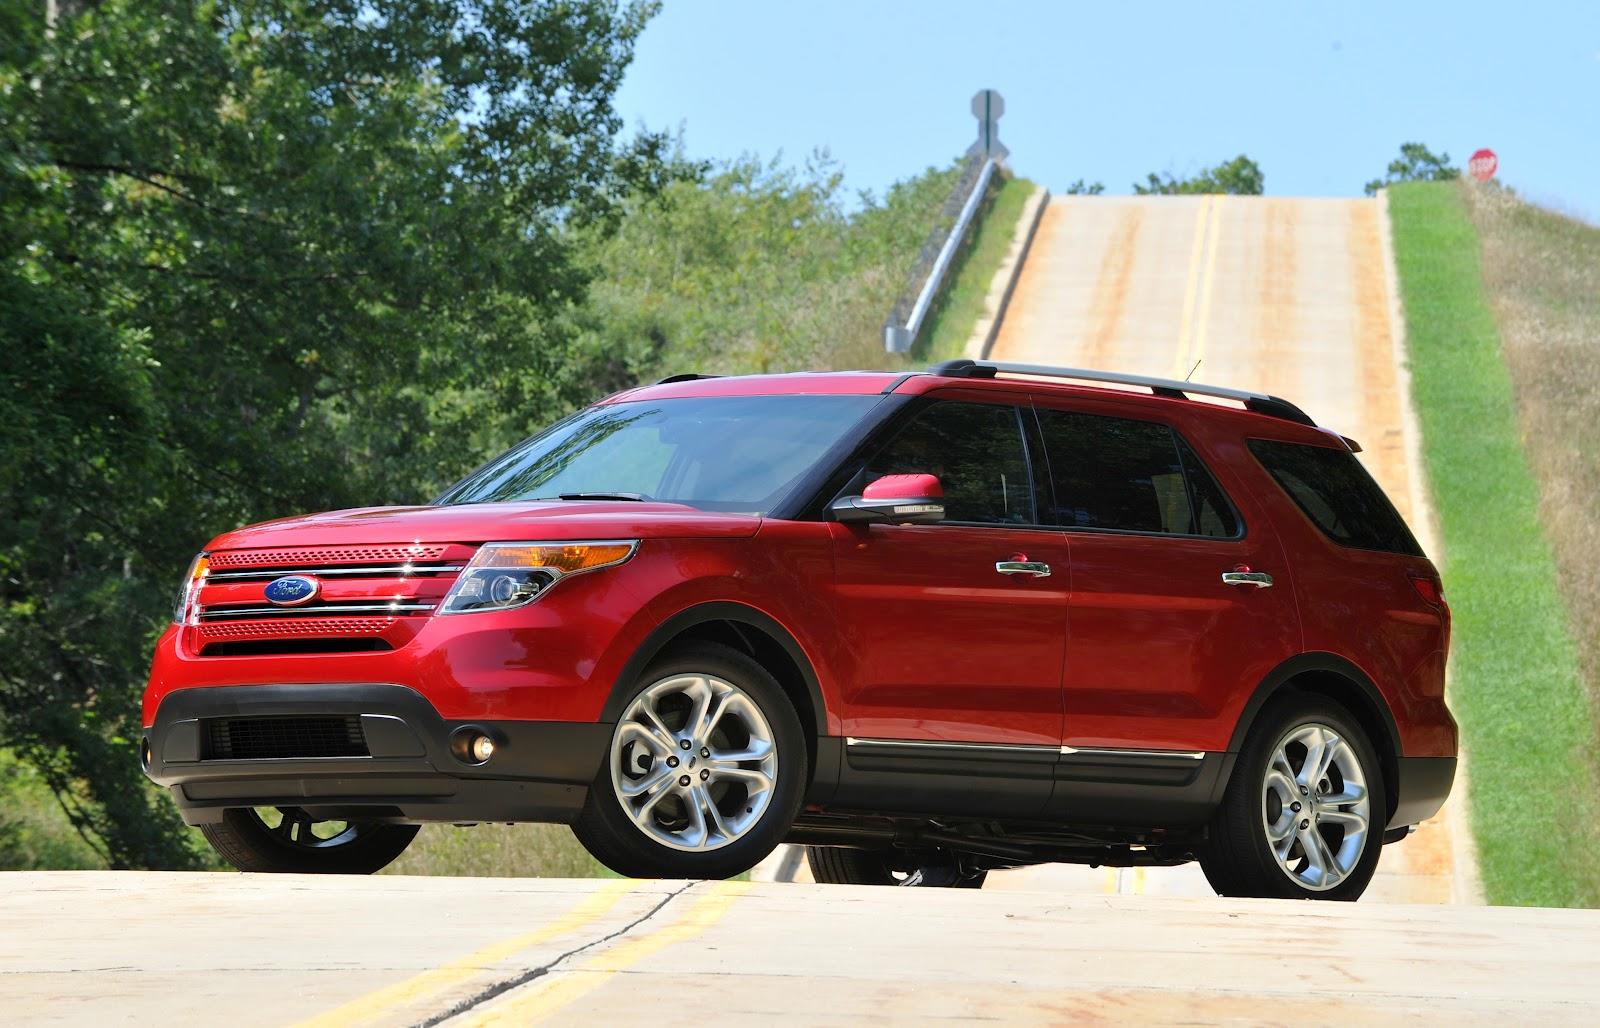 gas mileage of 2013 ford explorer fuel economy autos post. Black Bedroom Furniture Sets. Home Design Ideas